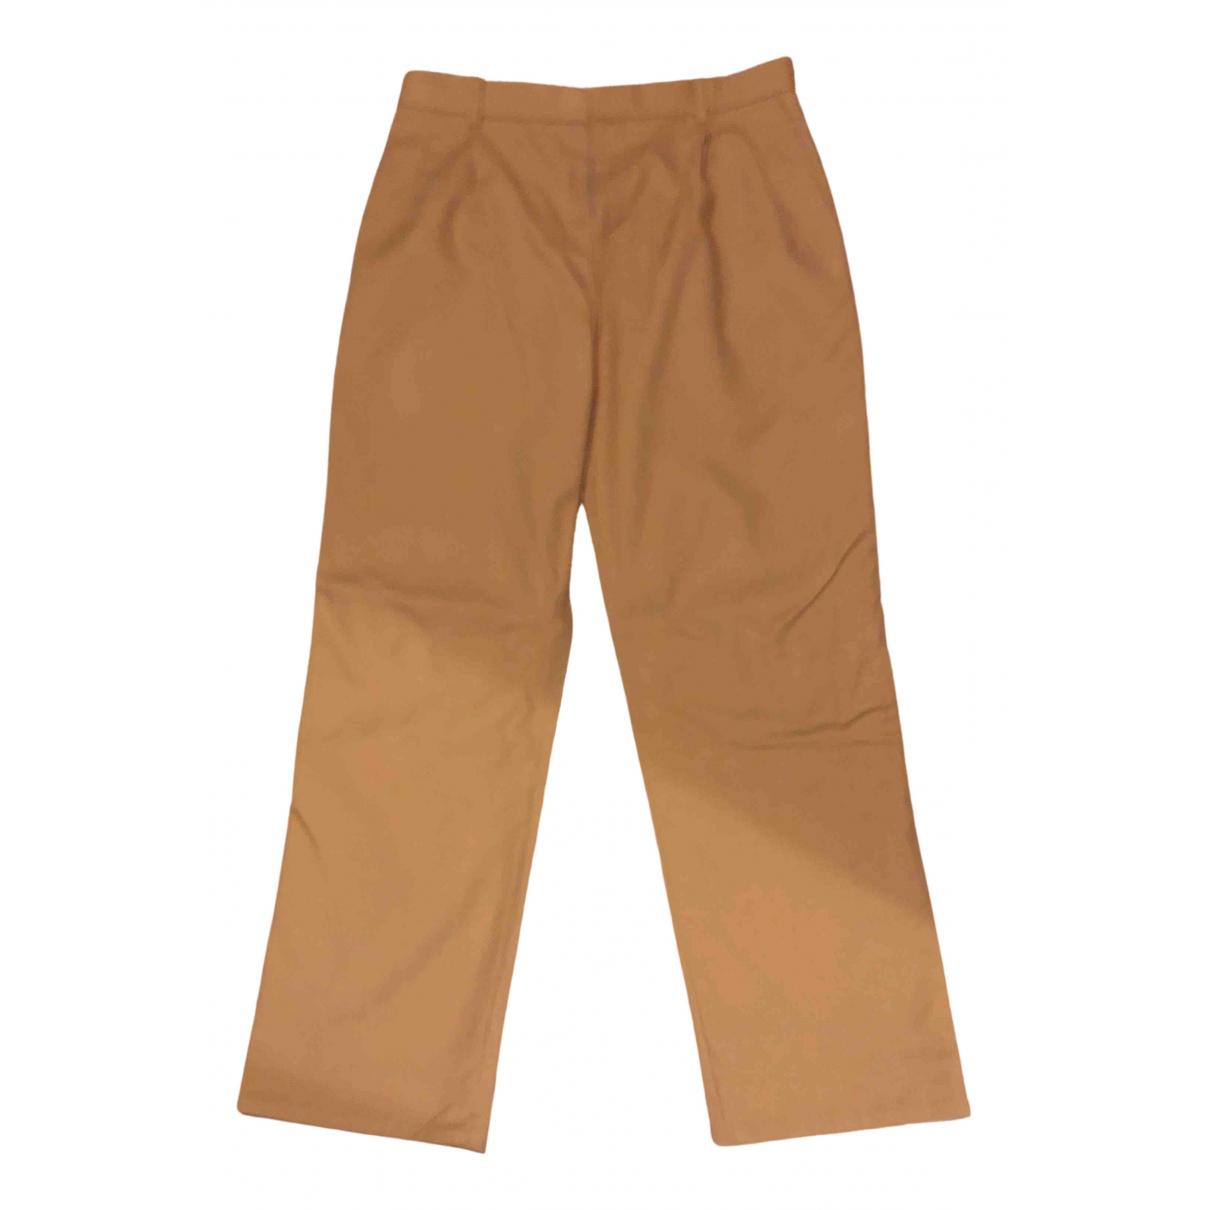 Calvin Klein 205w39nyc N Beige Cotton Trousers for Men 48 IT